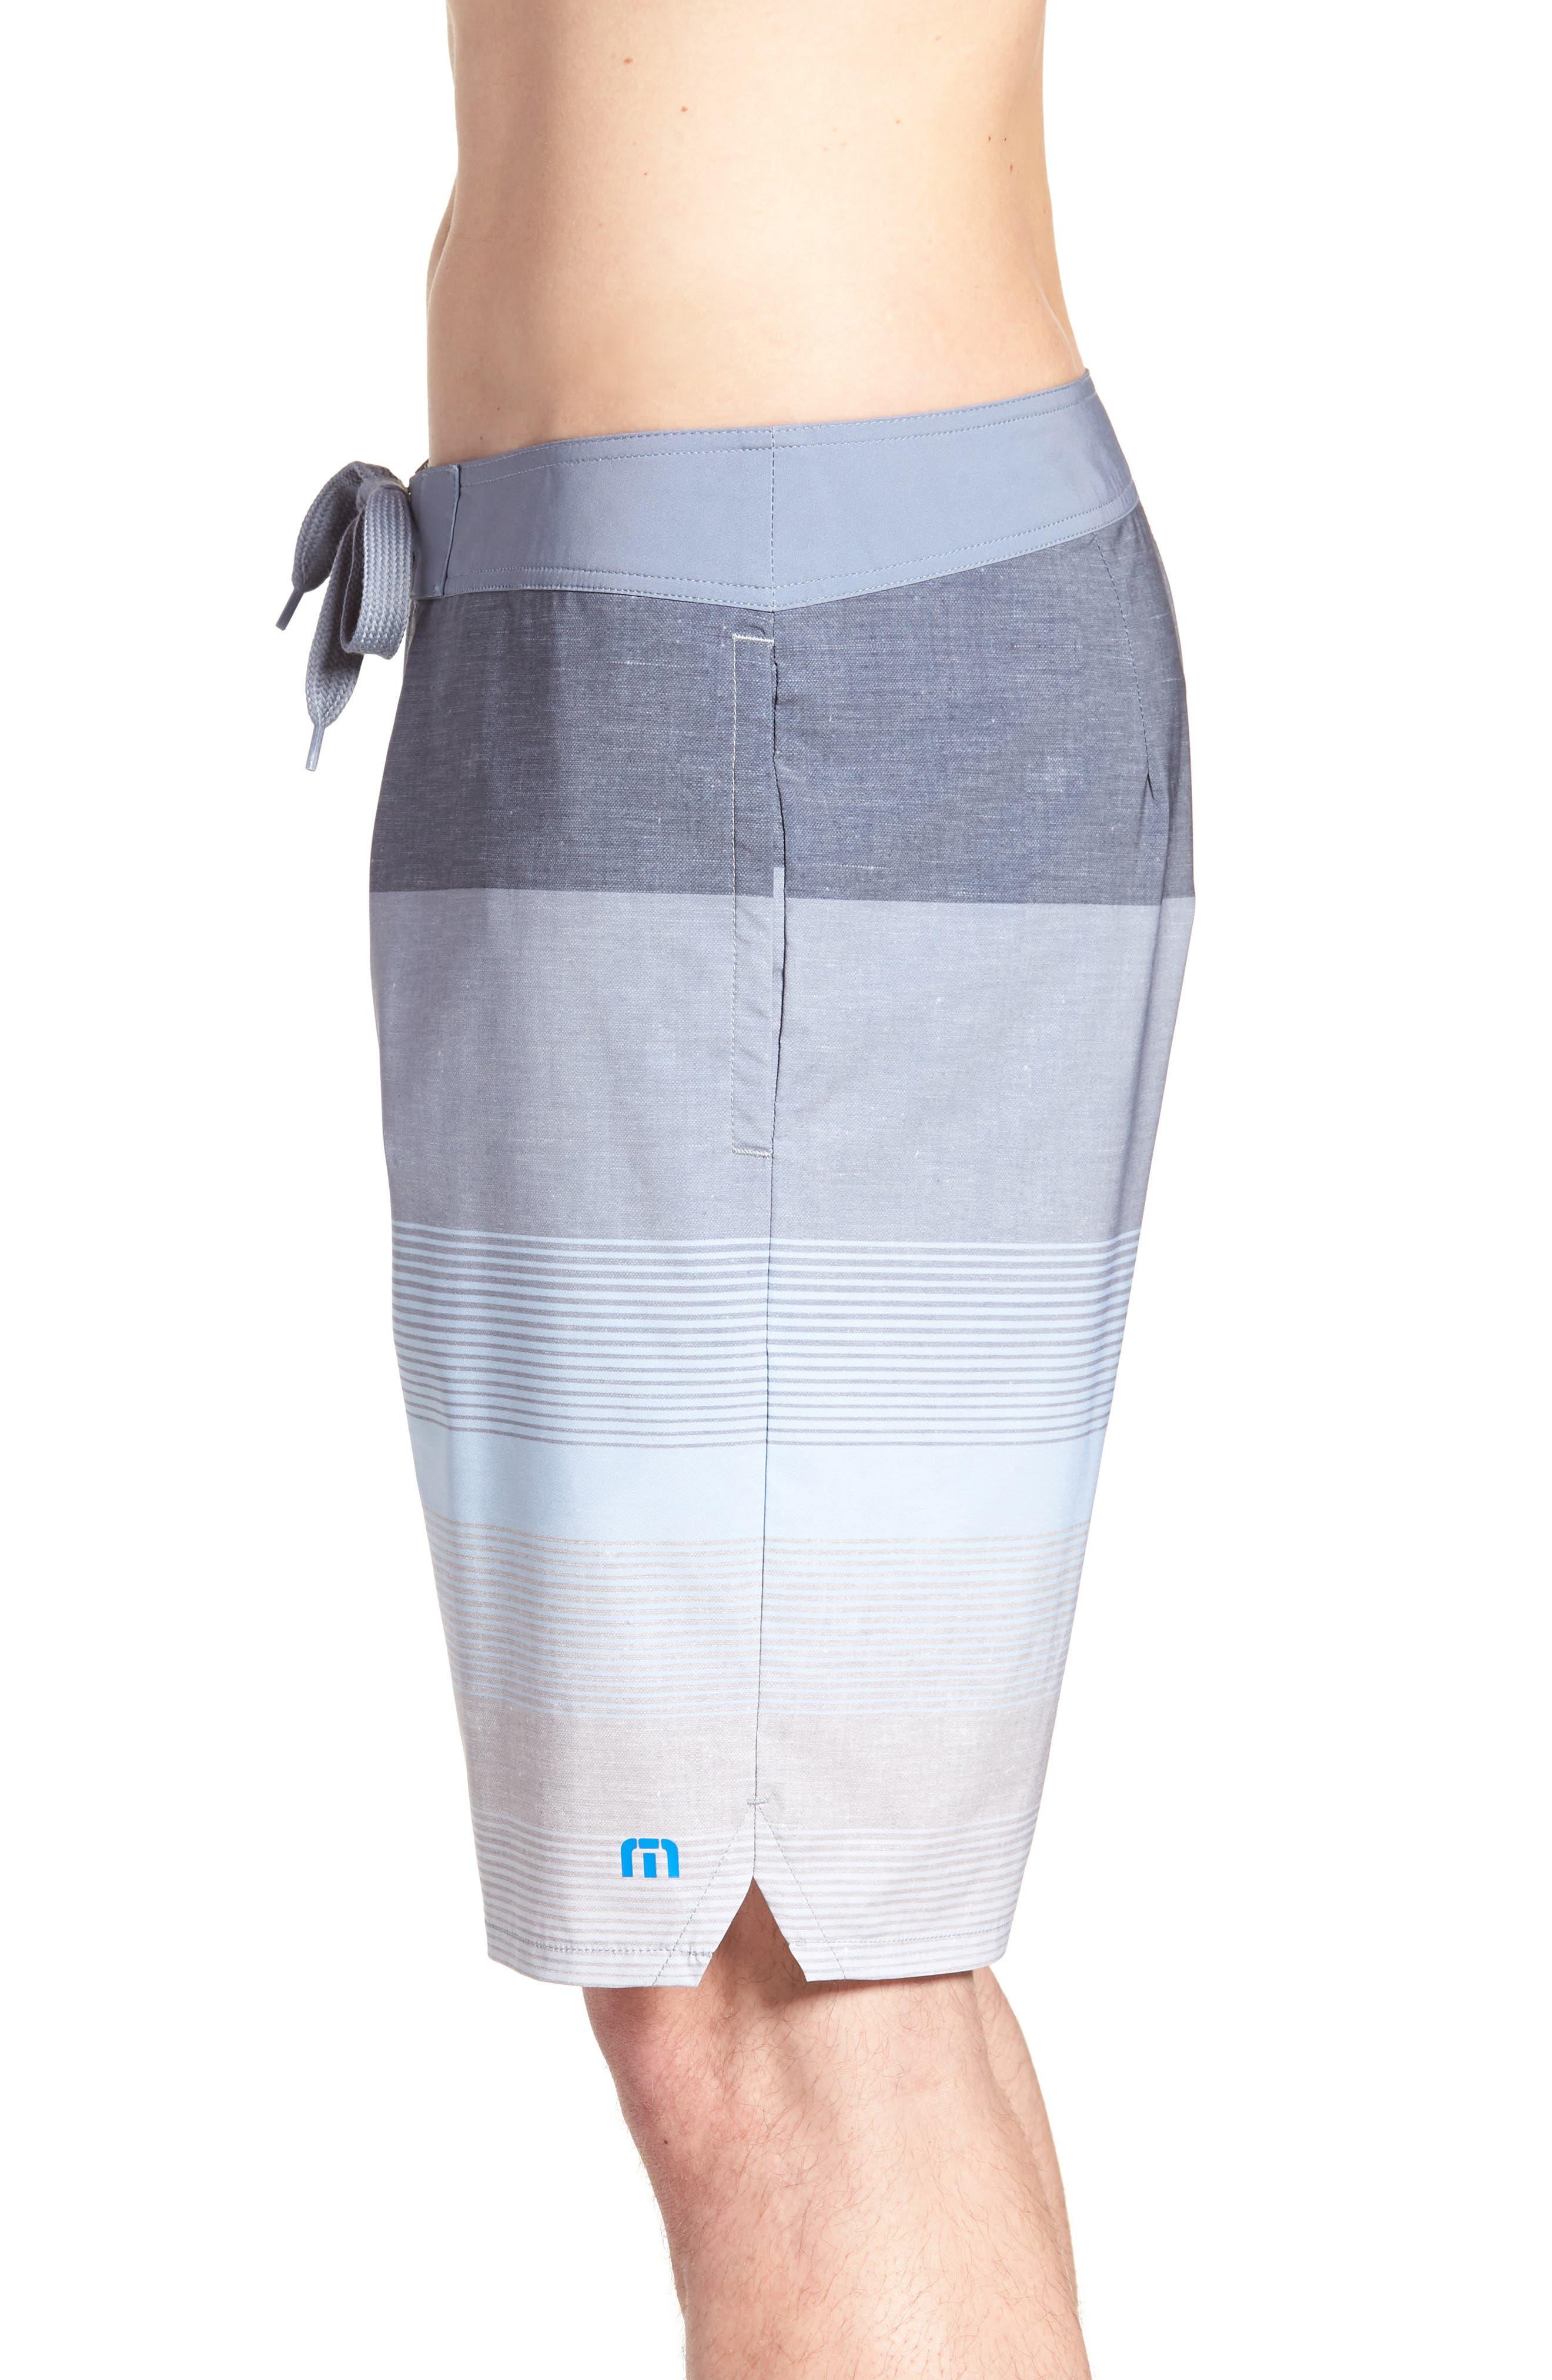 Seegrid Regular Fit Board Shorts,                             Alternate thumbnail 3, color,                             Heather Blue Nights